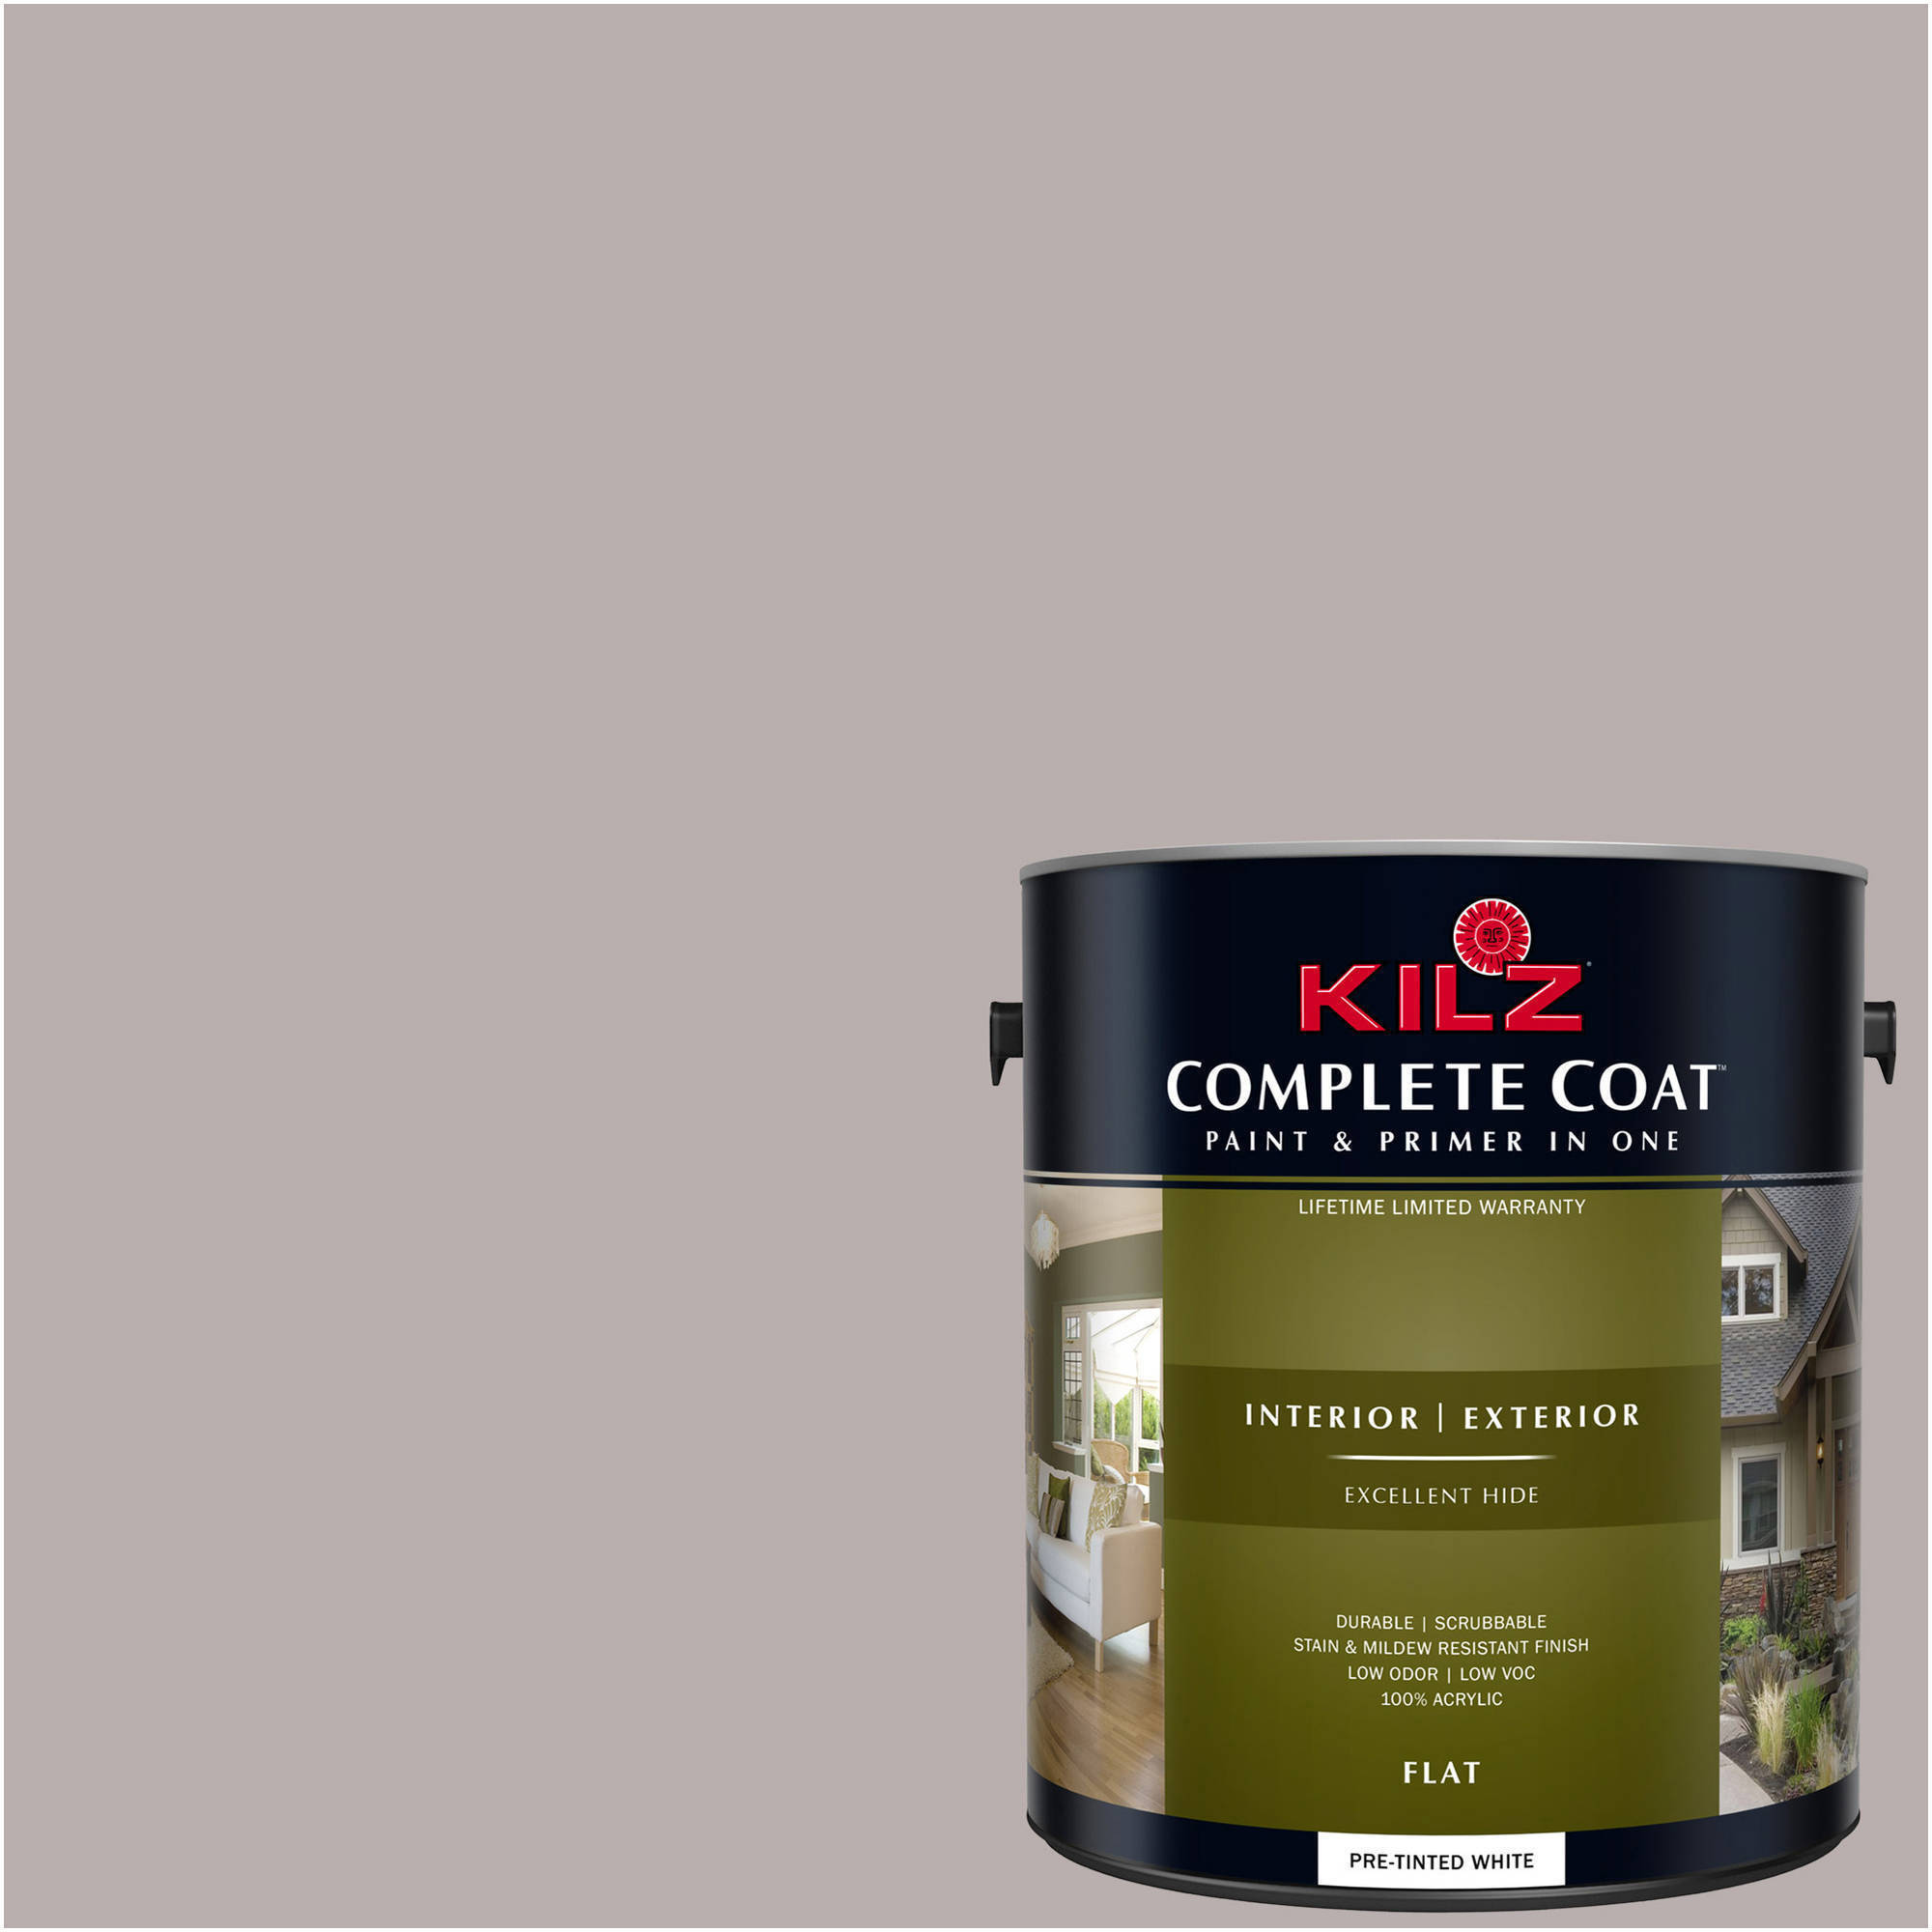 KILZ COMPLETE COAT Interior/Exterior Paint & Primer in One #LA250-01 Natural Echo